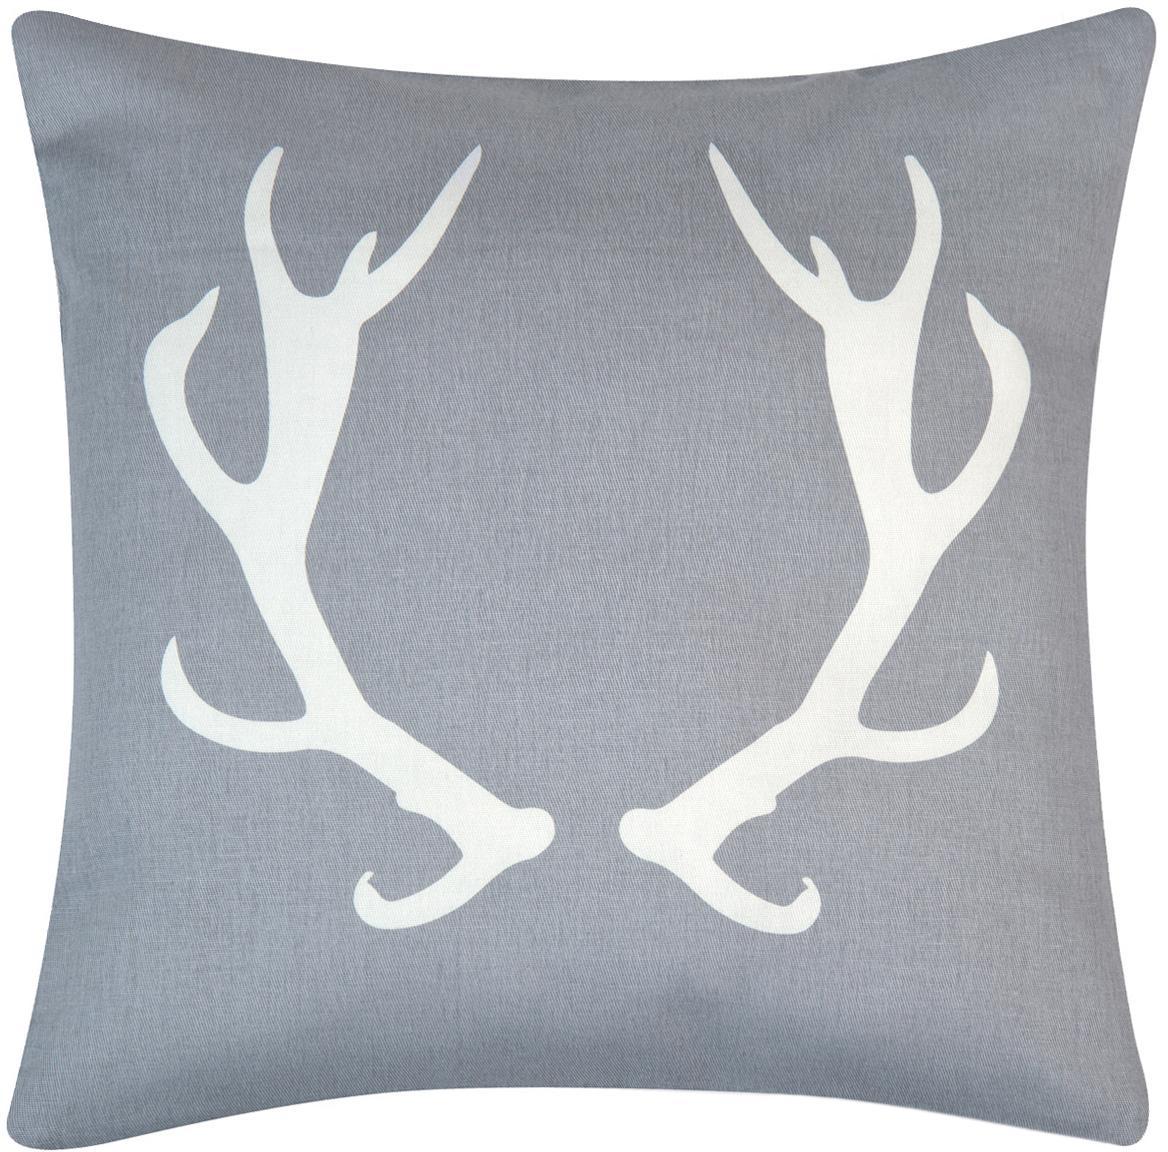 Funda de cojín Horns, 100%algodón, tela Panamá, Gris, crudo, An 40 x L 40 cm